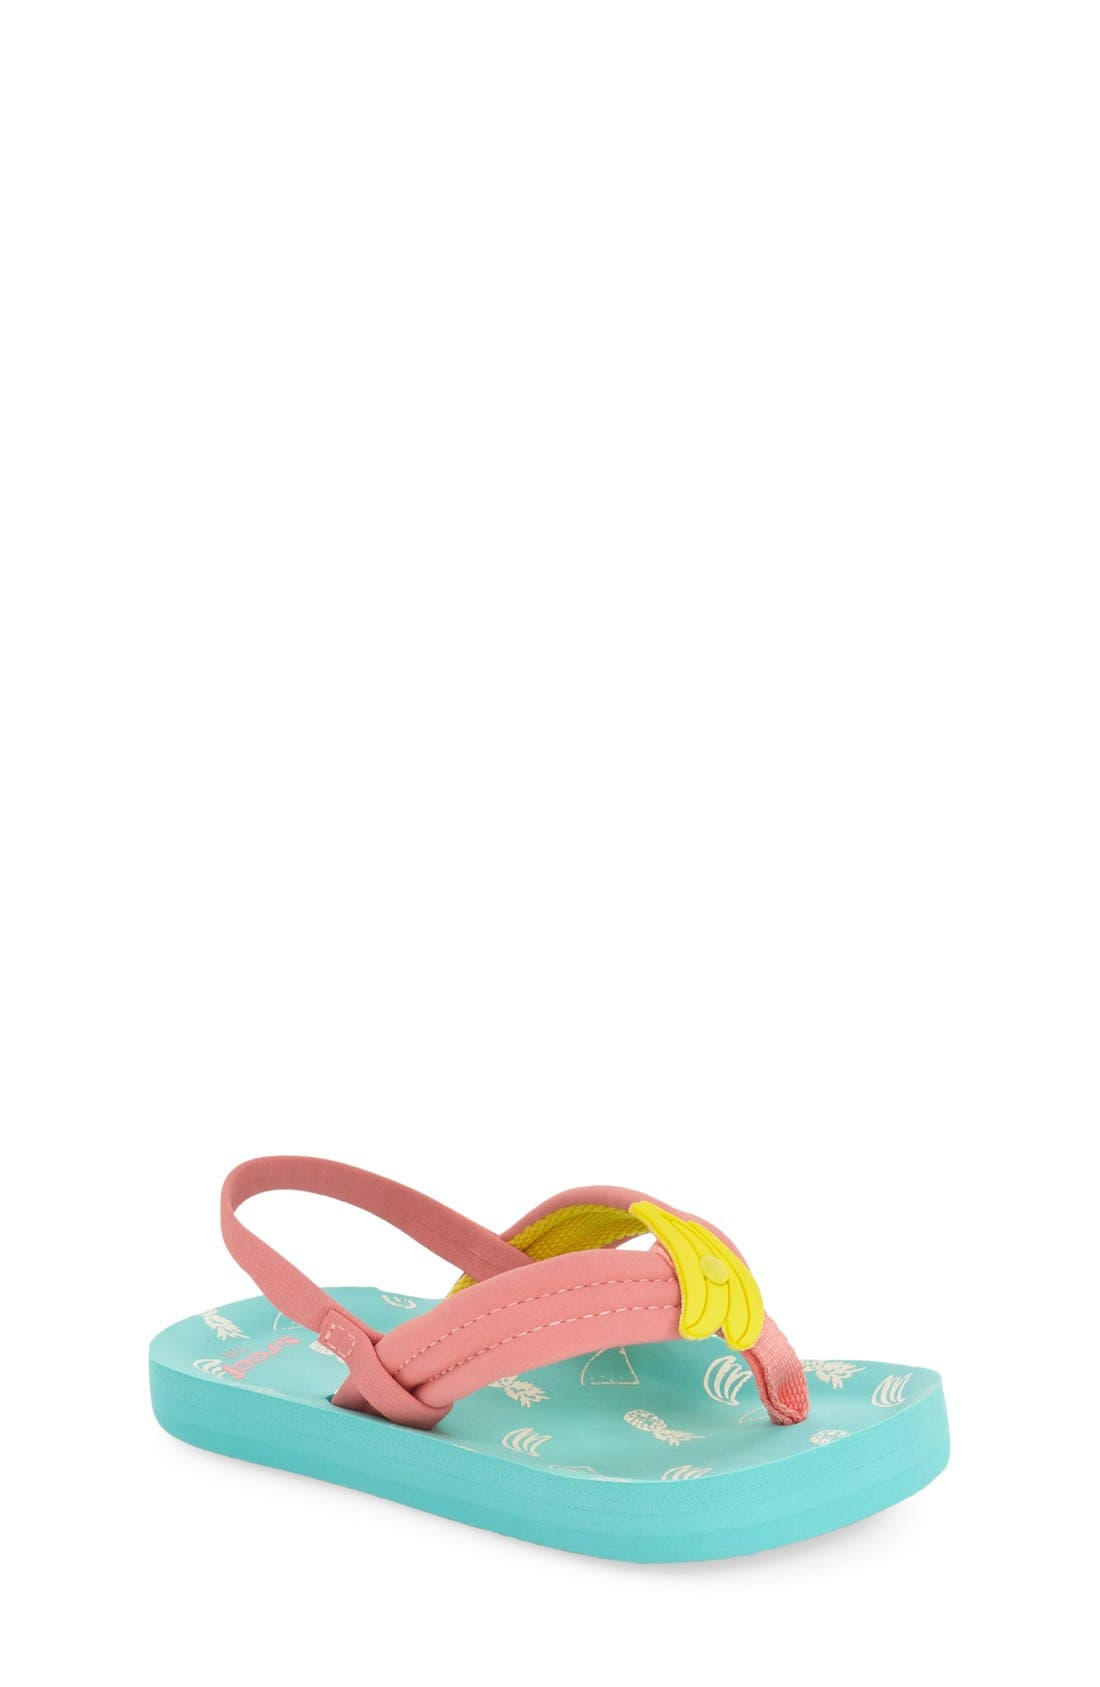 'Little Ahi' Thong Sandal,                             Alternate thumbnail 23, color,